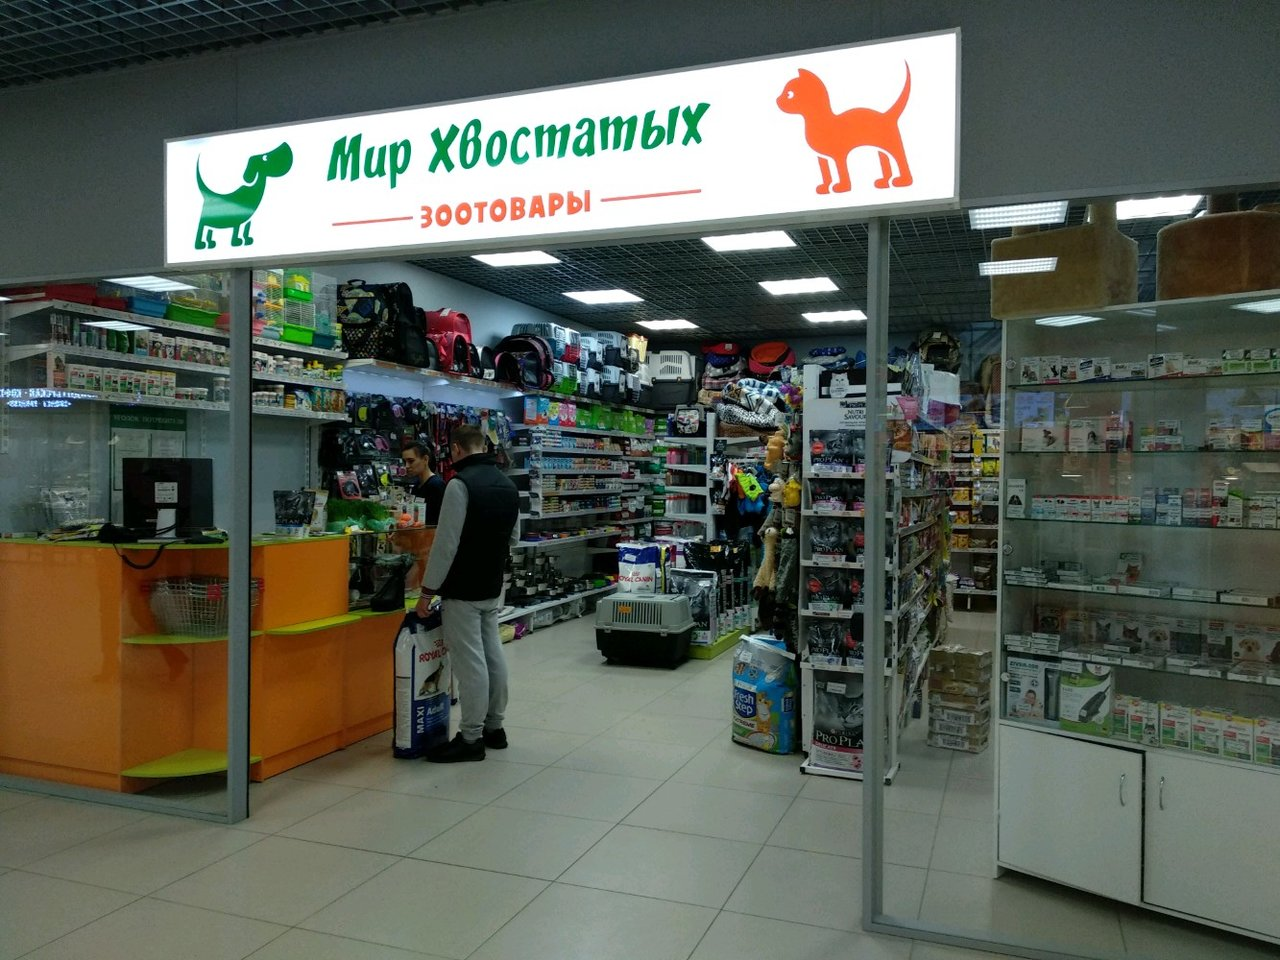 Мир Хвостатых Екатеринбург Интернет Магазин Каталог